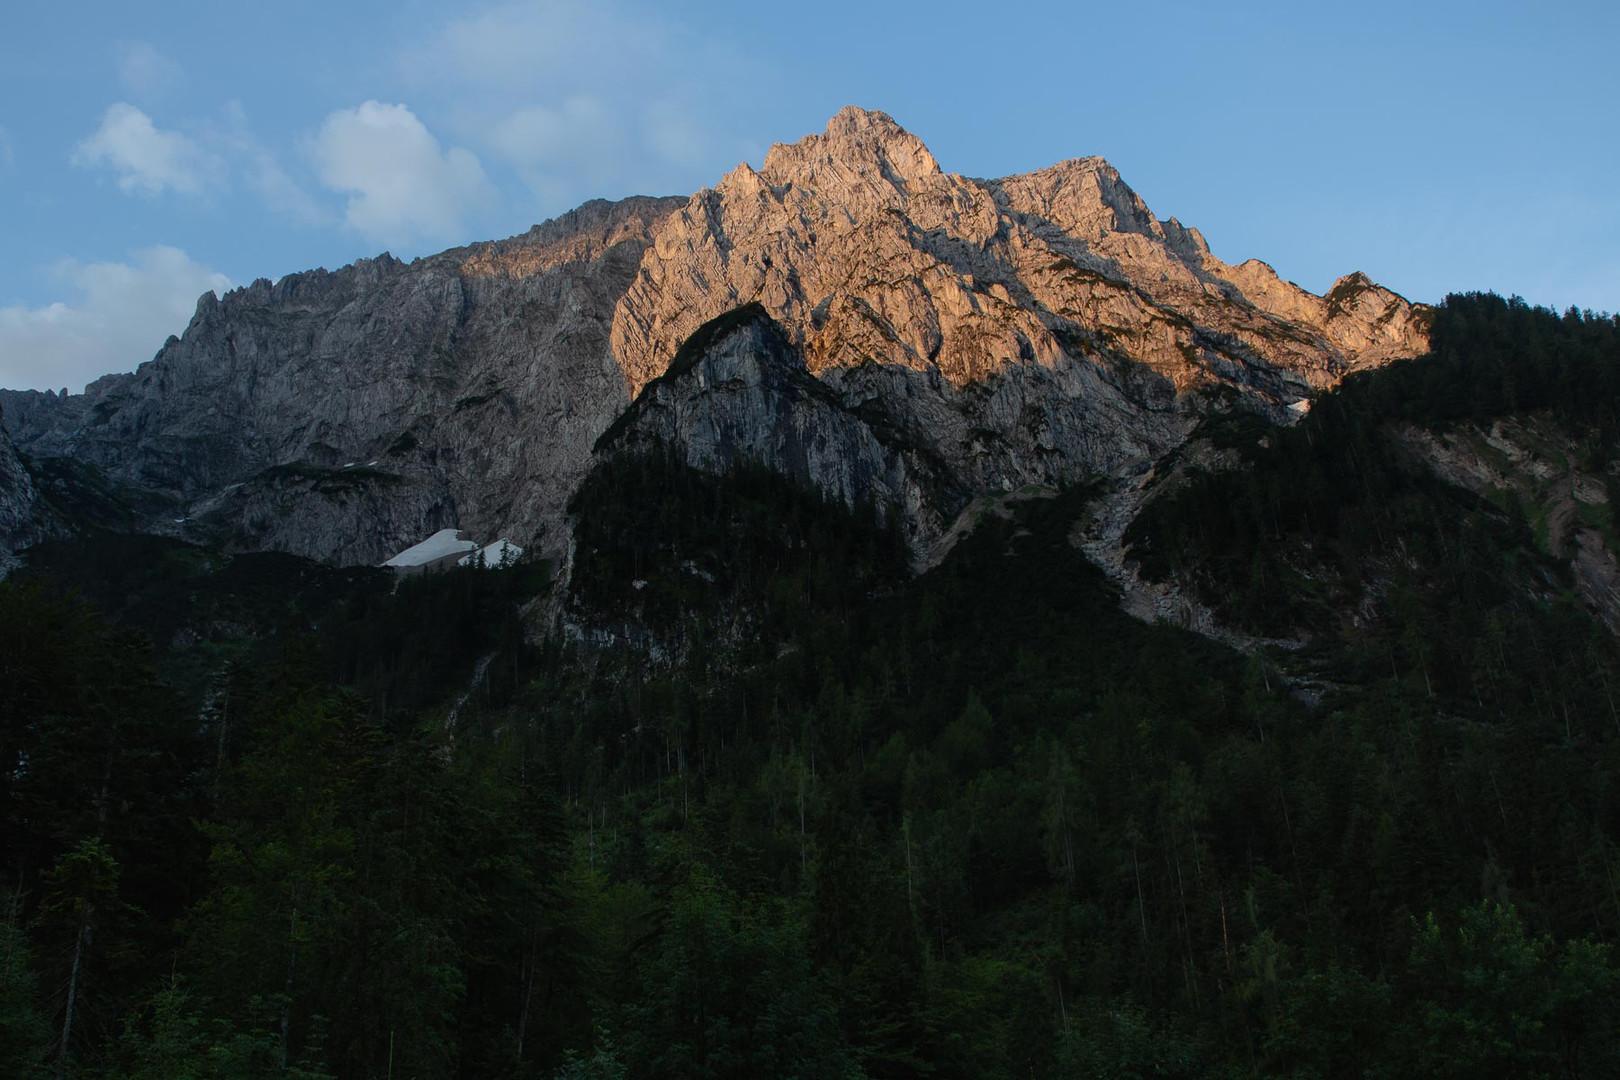 Tyrolean Alps, 2019